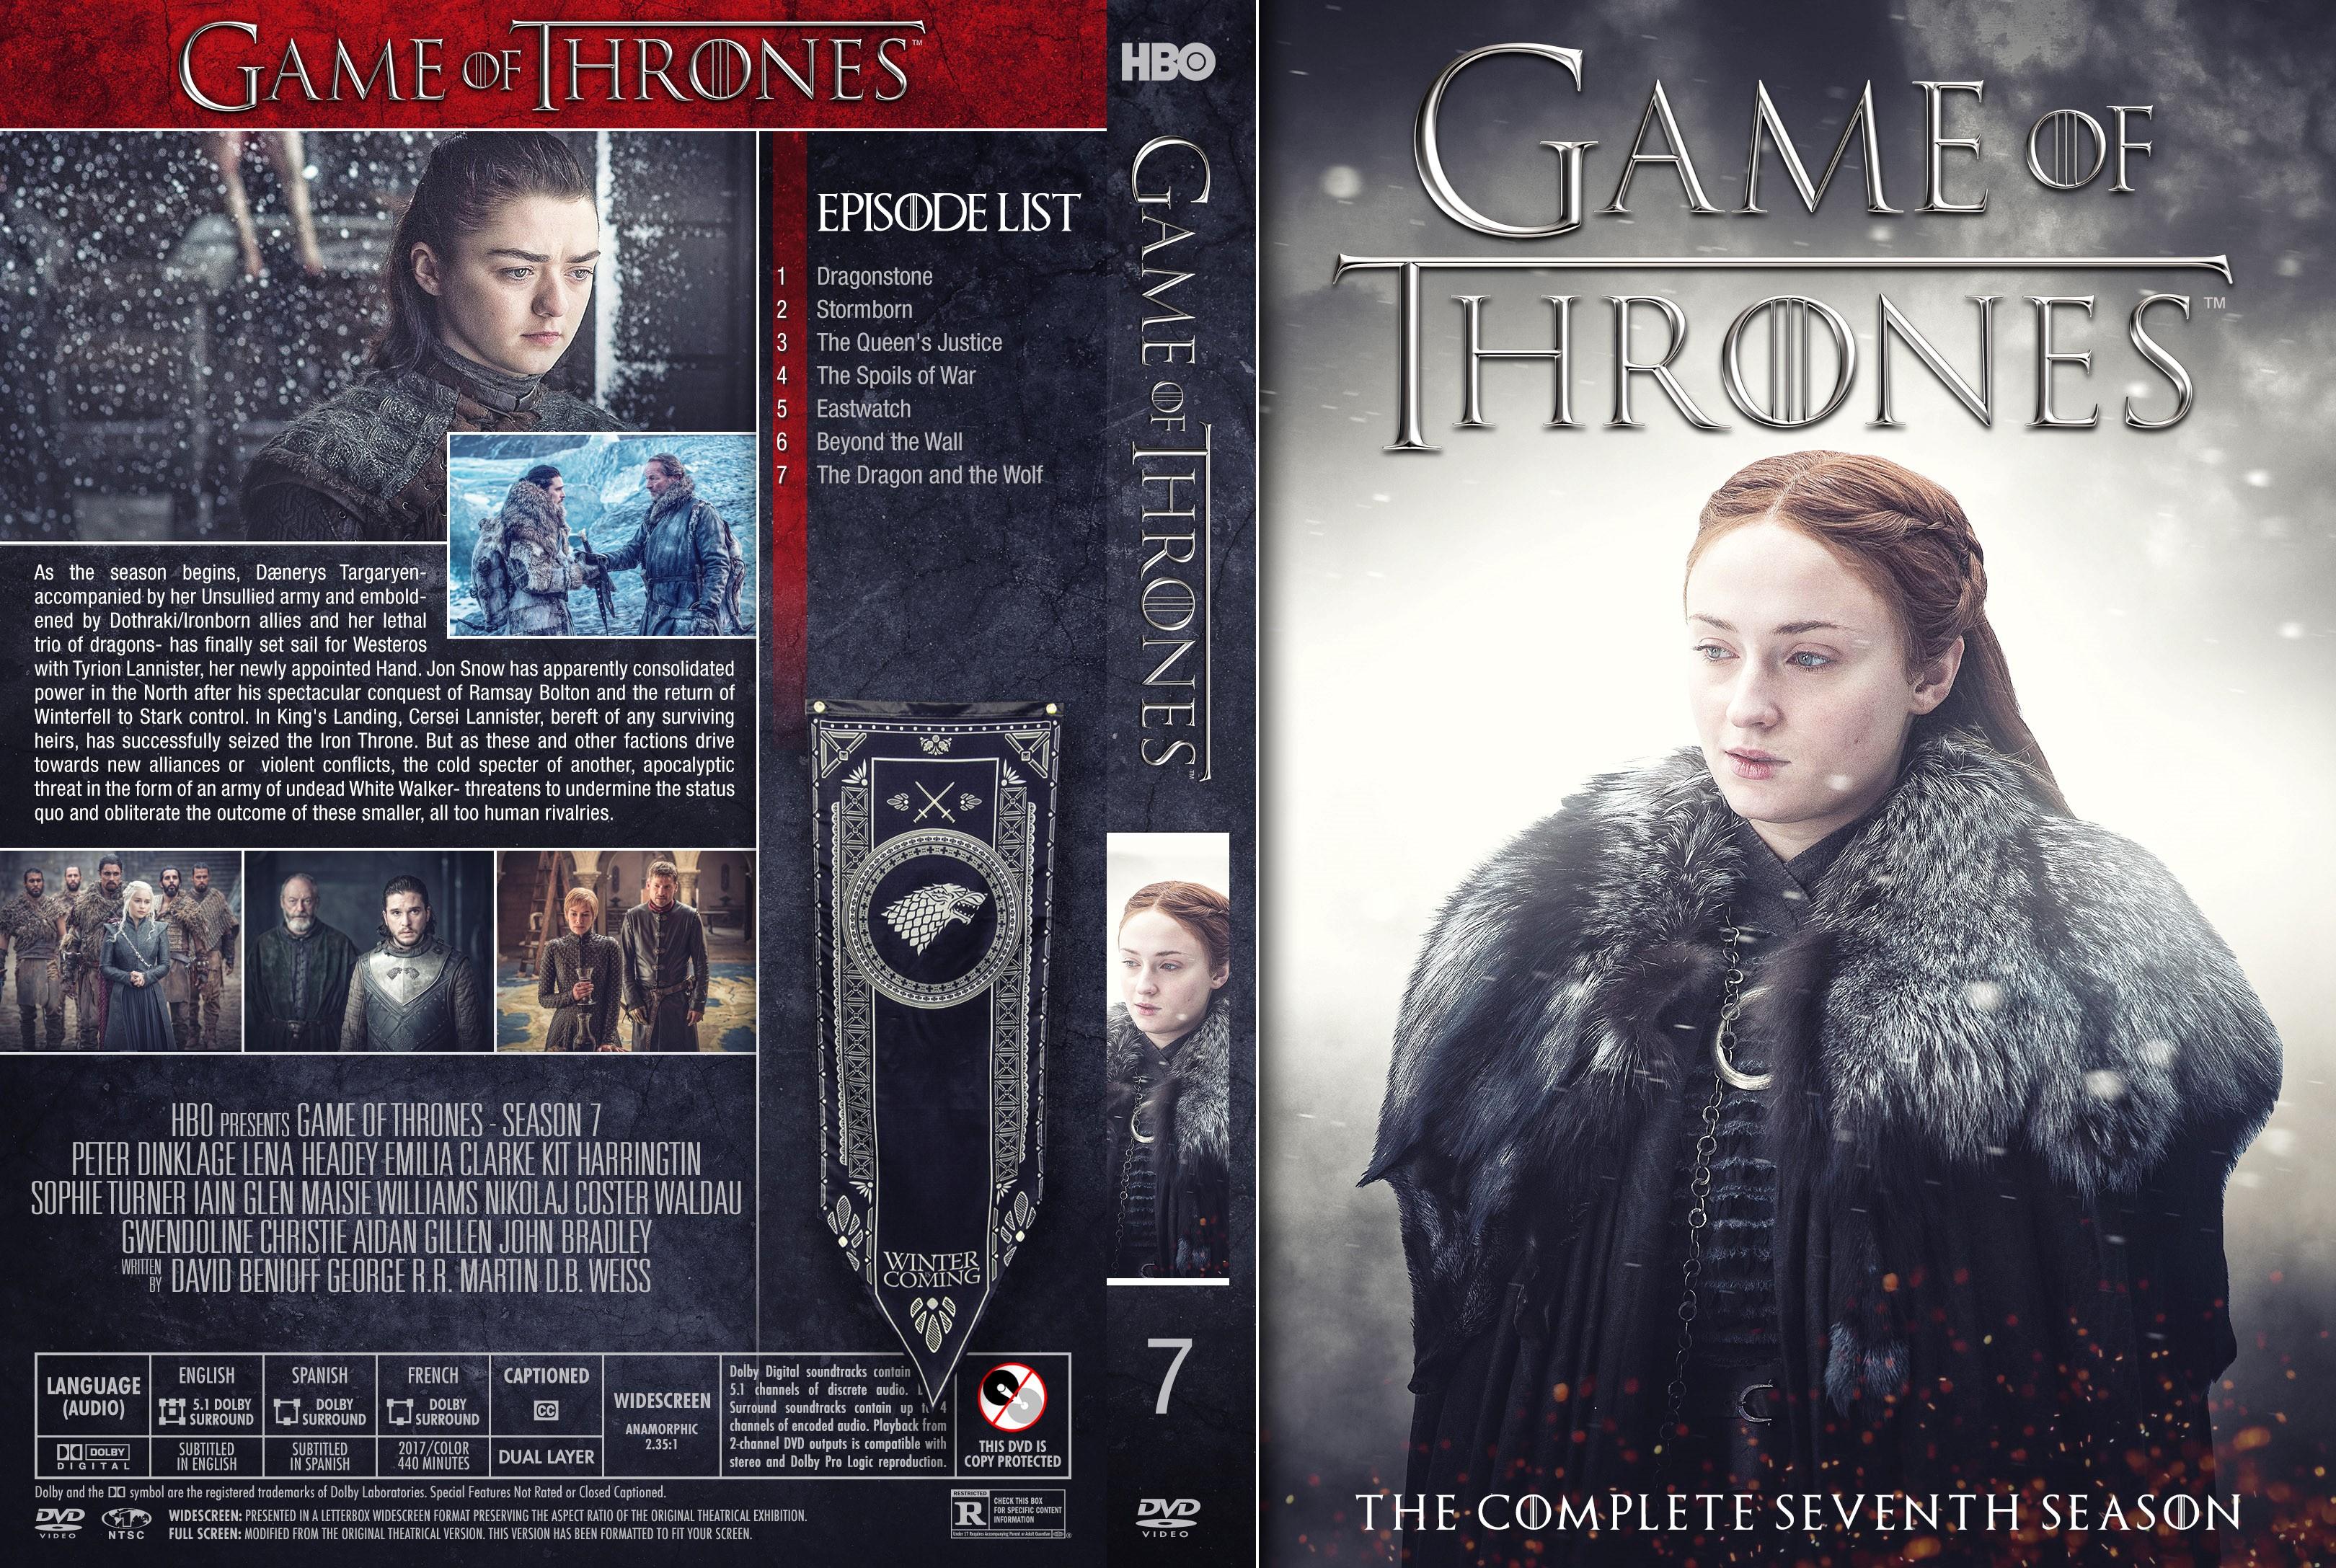 Game Of Trone Season 1 Dvd Cover: Game Of Thrones Season 7 DVD Cover